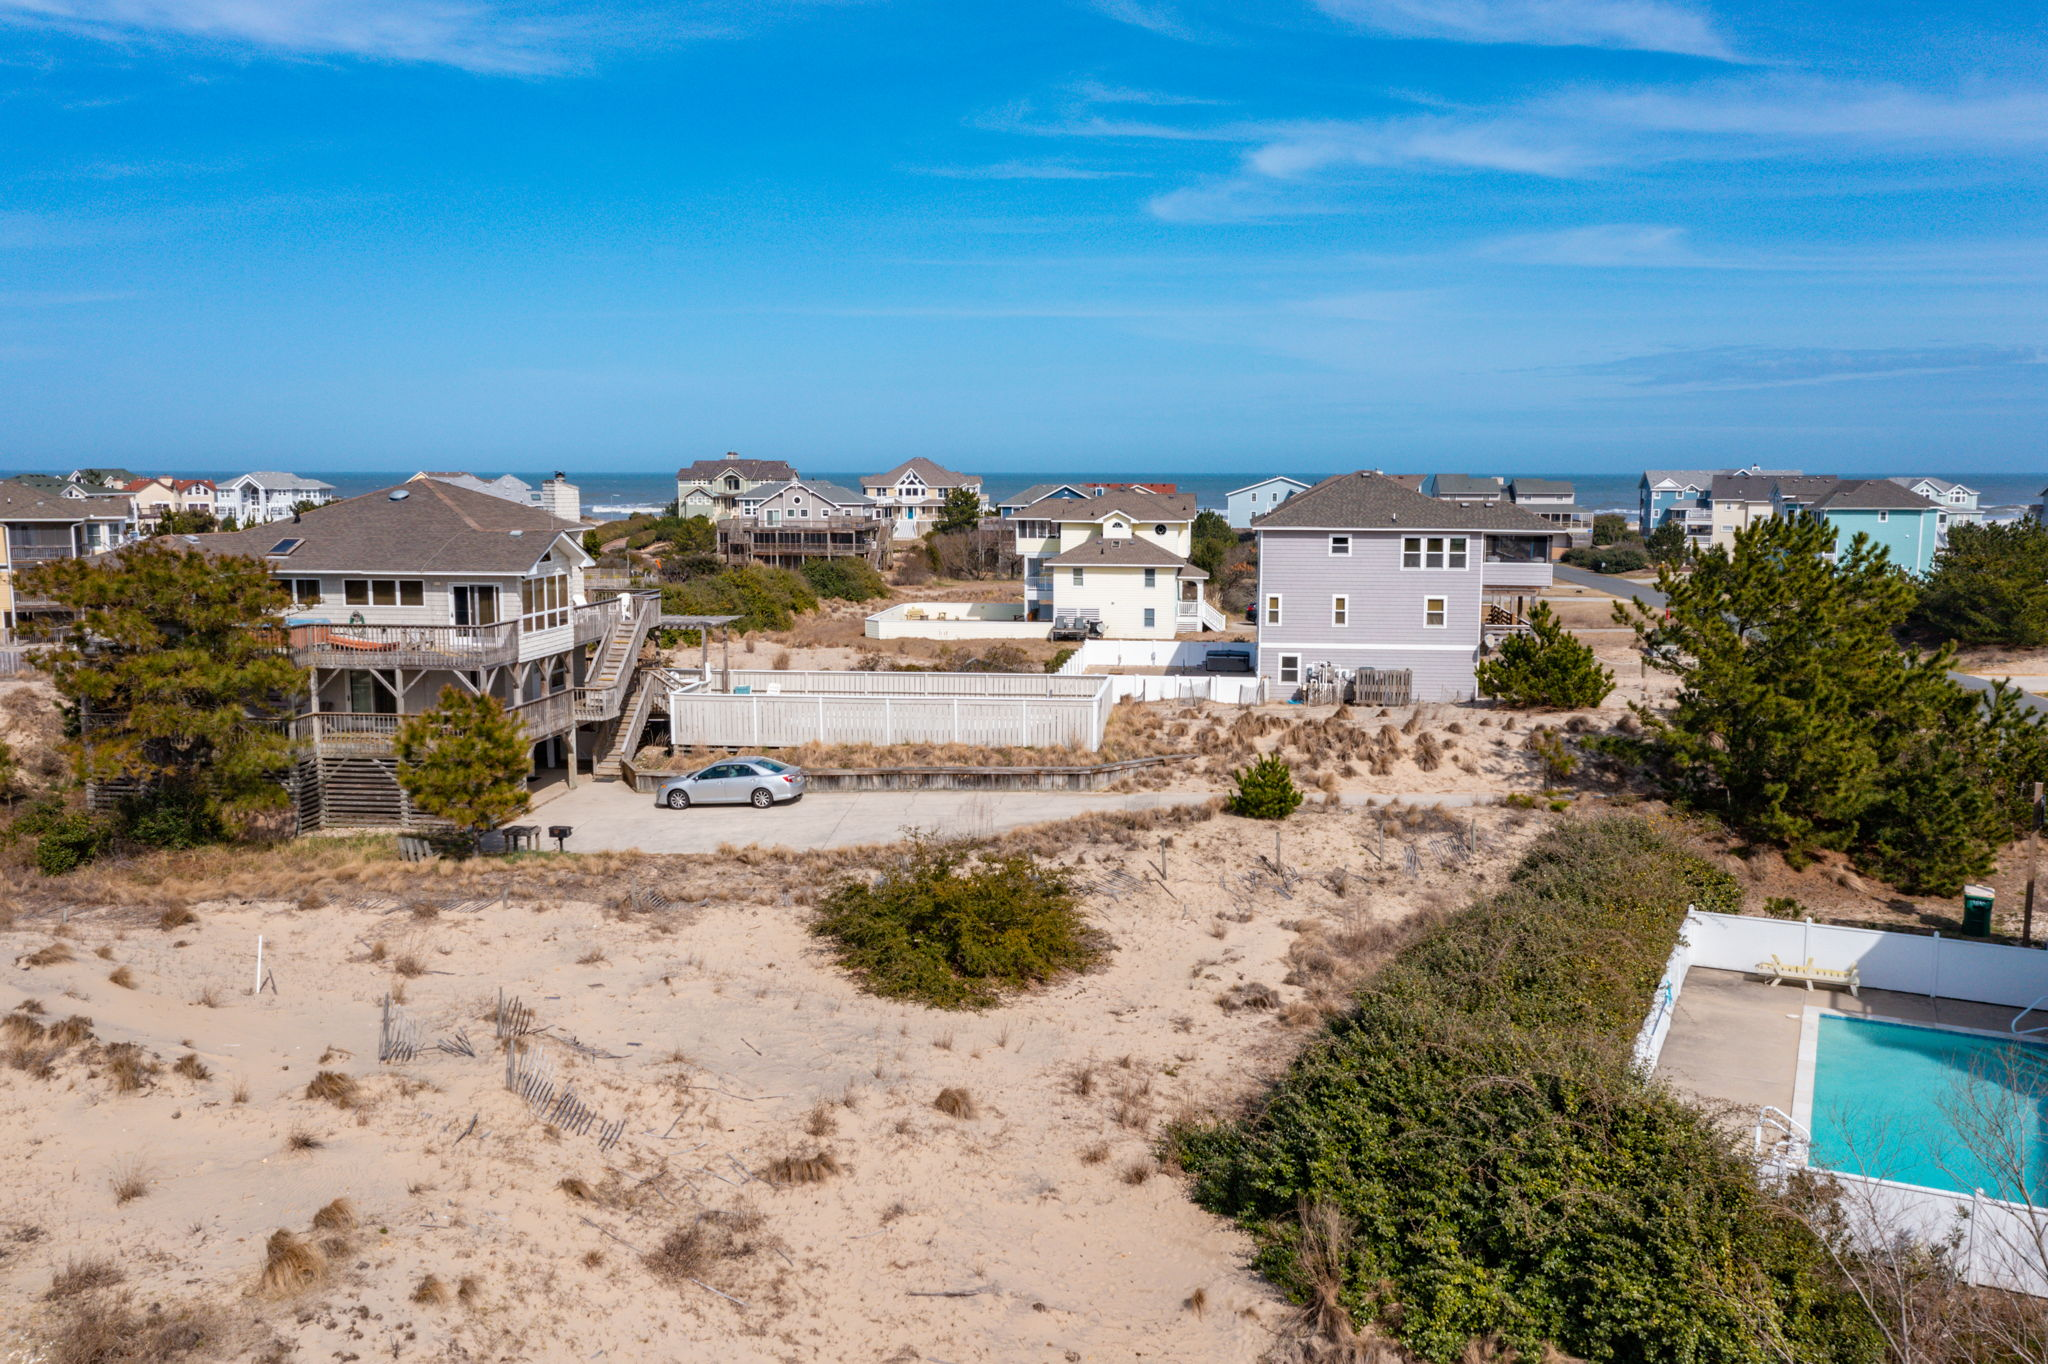 1219 Windance | Roof Deck View